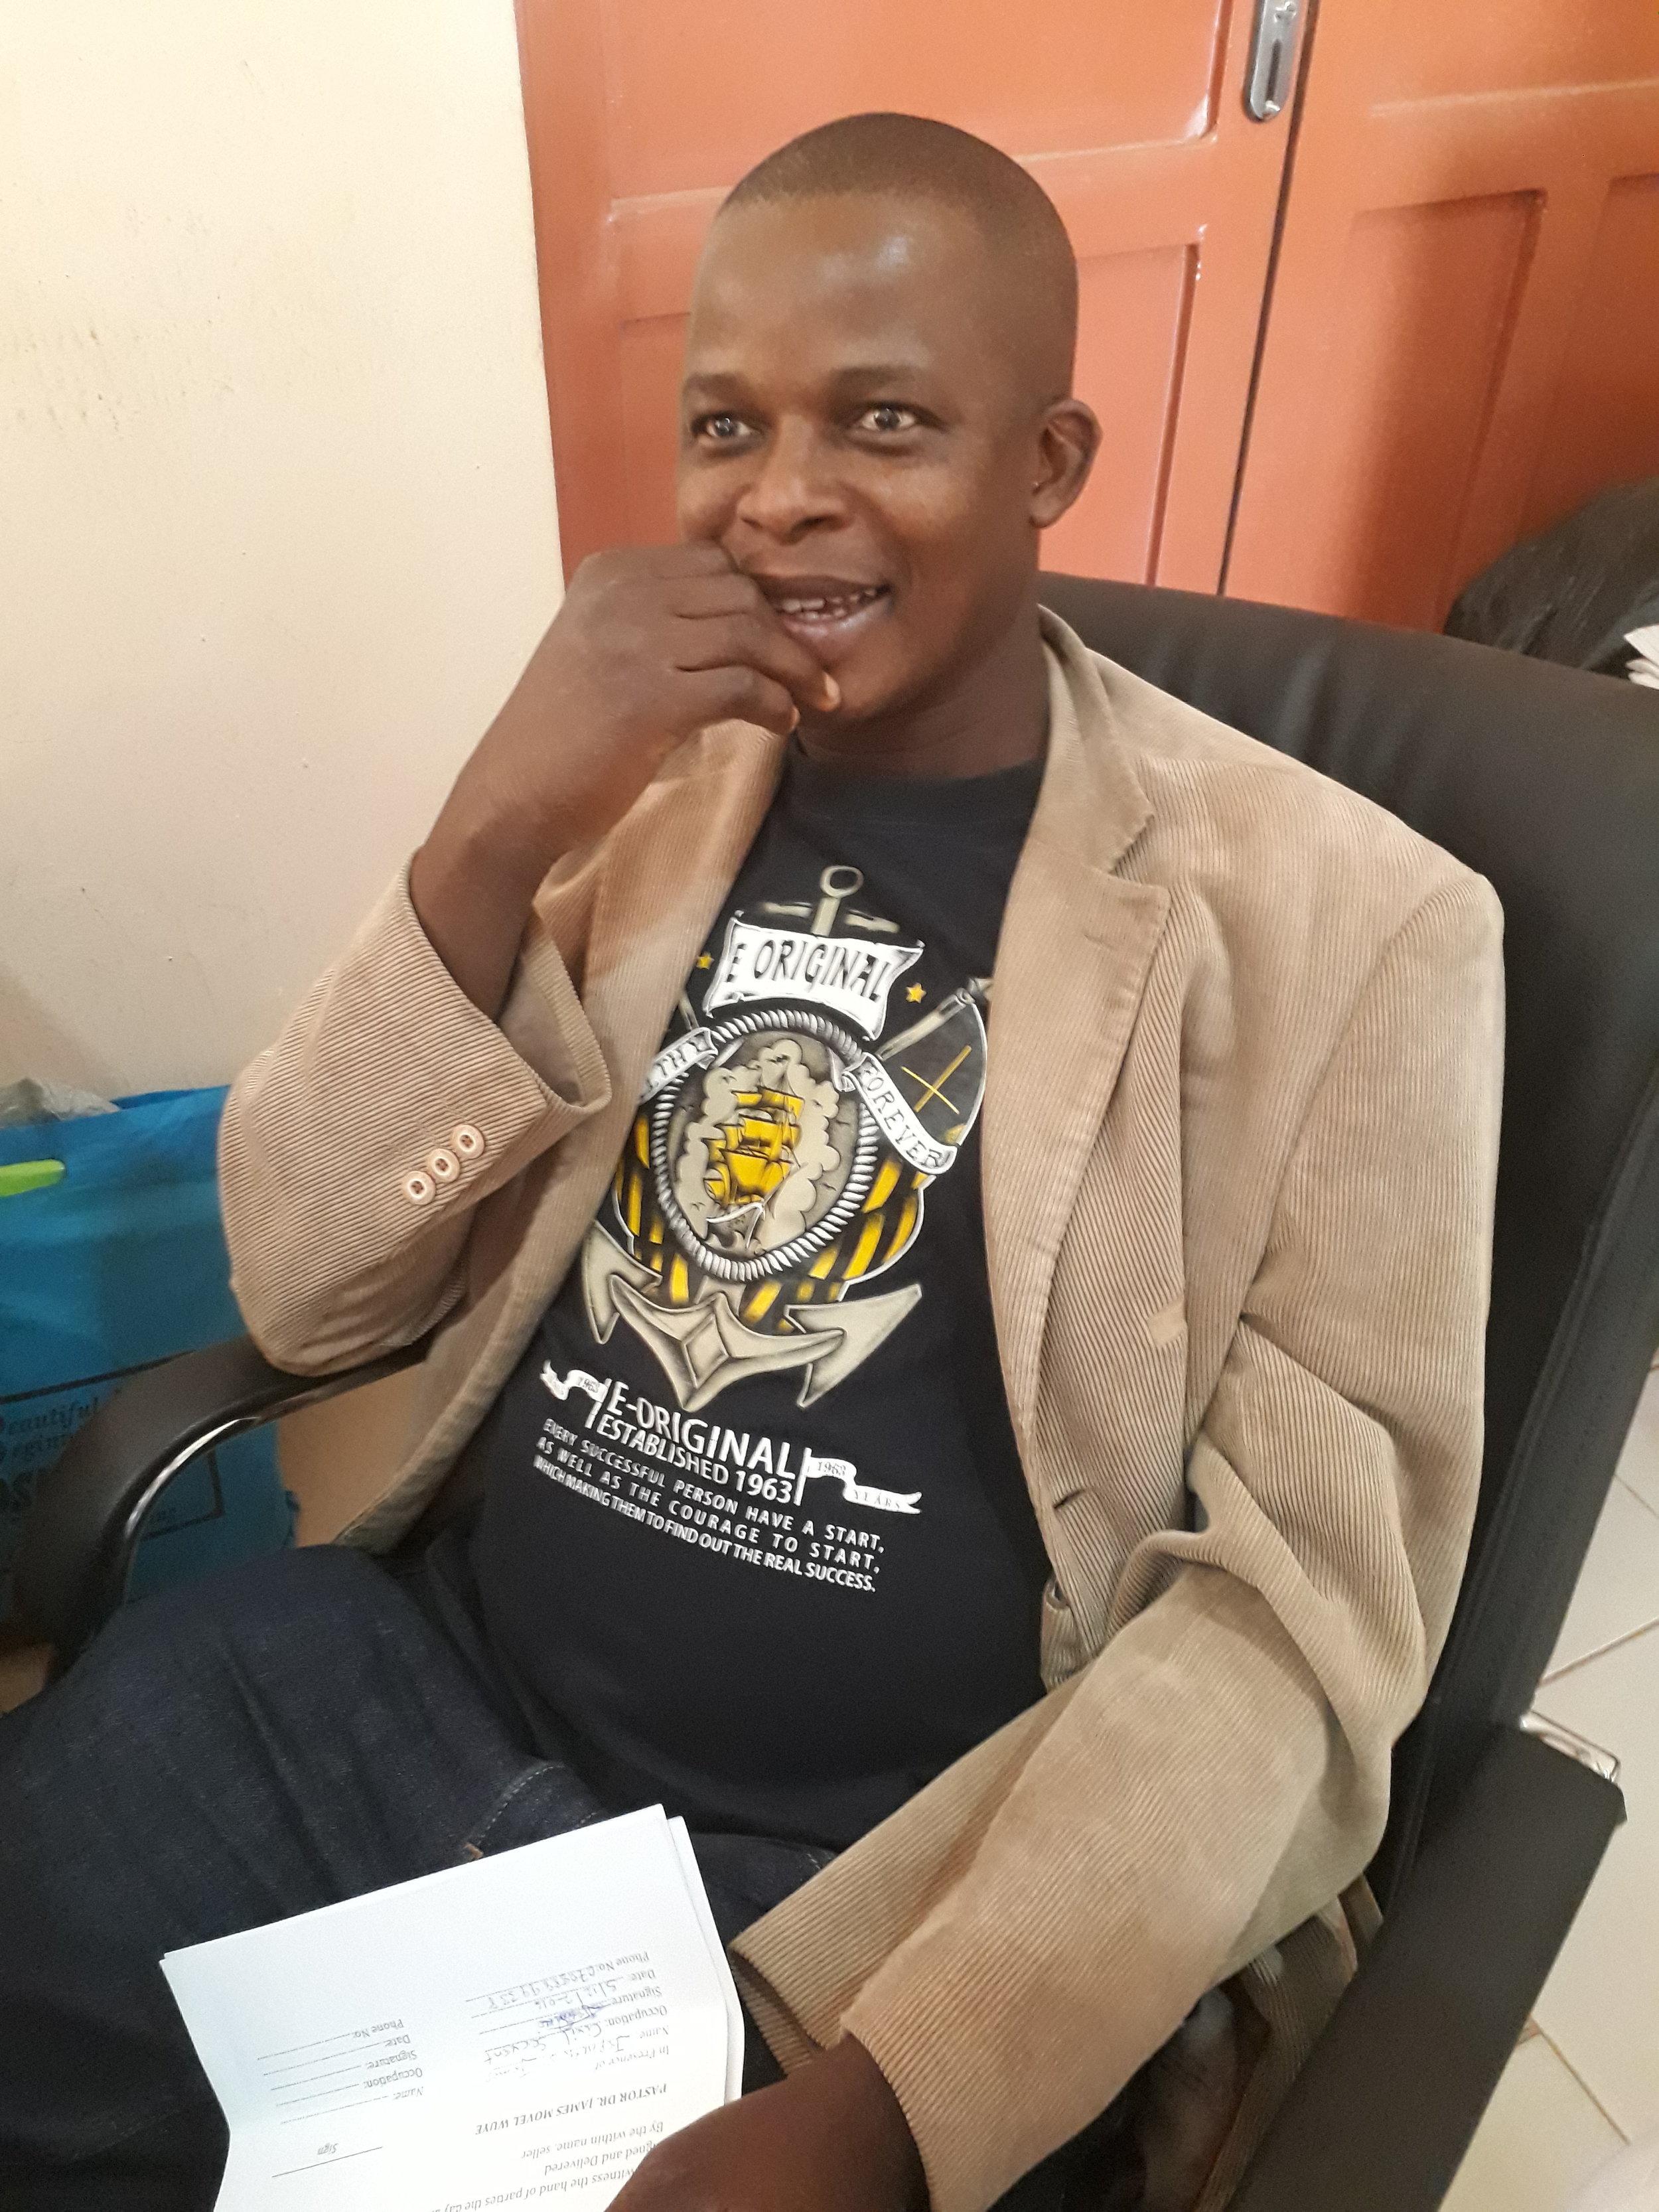 Samson Auta, CPAN Cordinator, IMC. Mobile number: 0803-595-3105. Email: samsonauta1@gmail.com